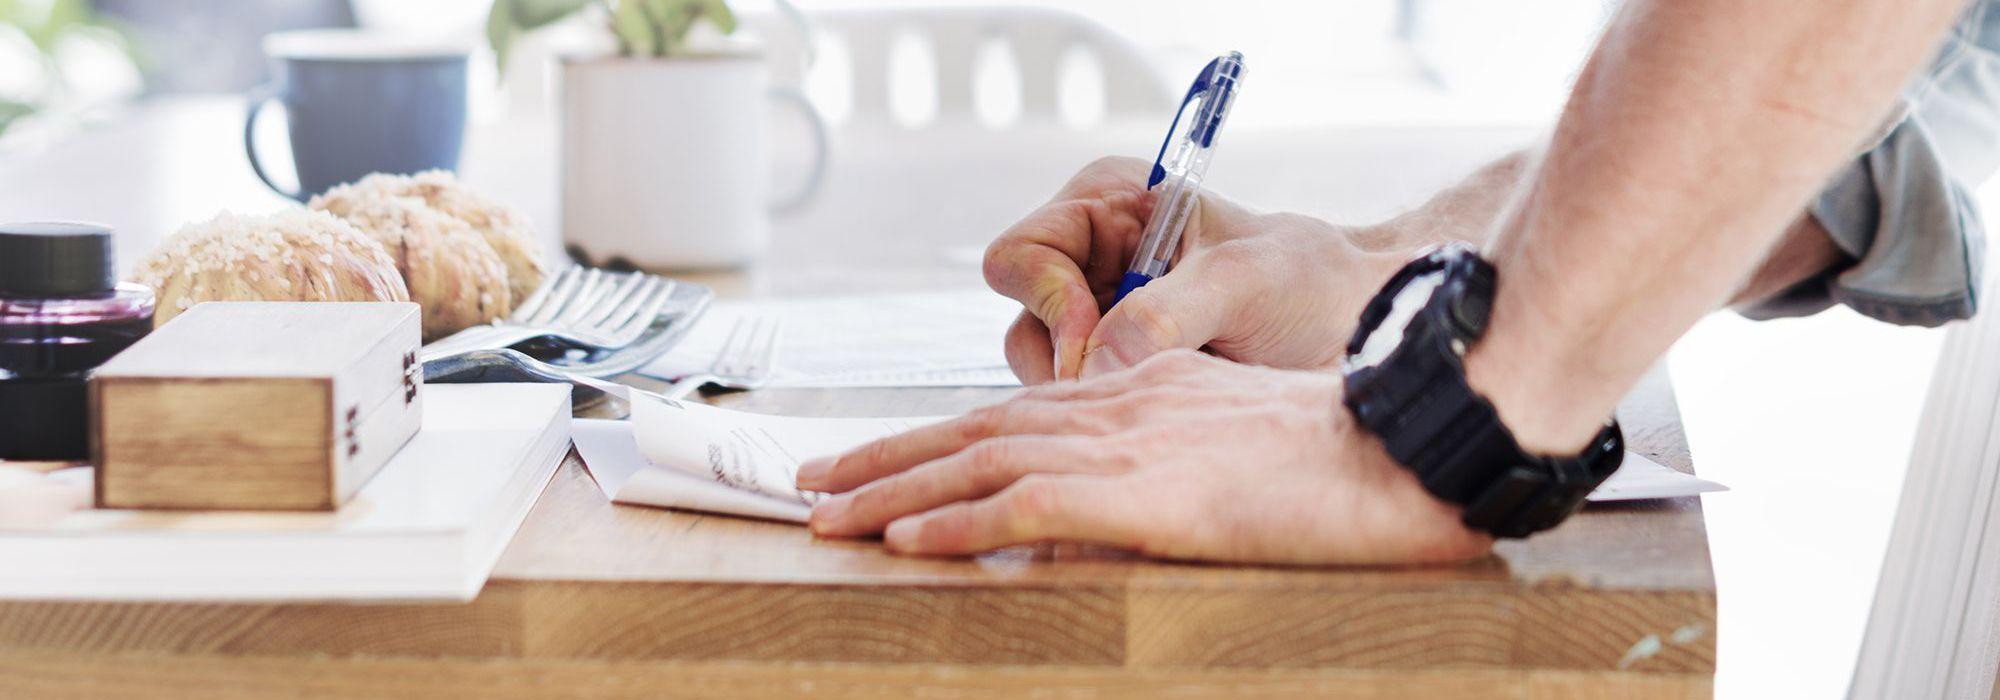 Handwritten notes data privacy